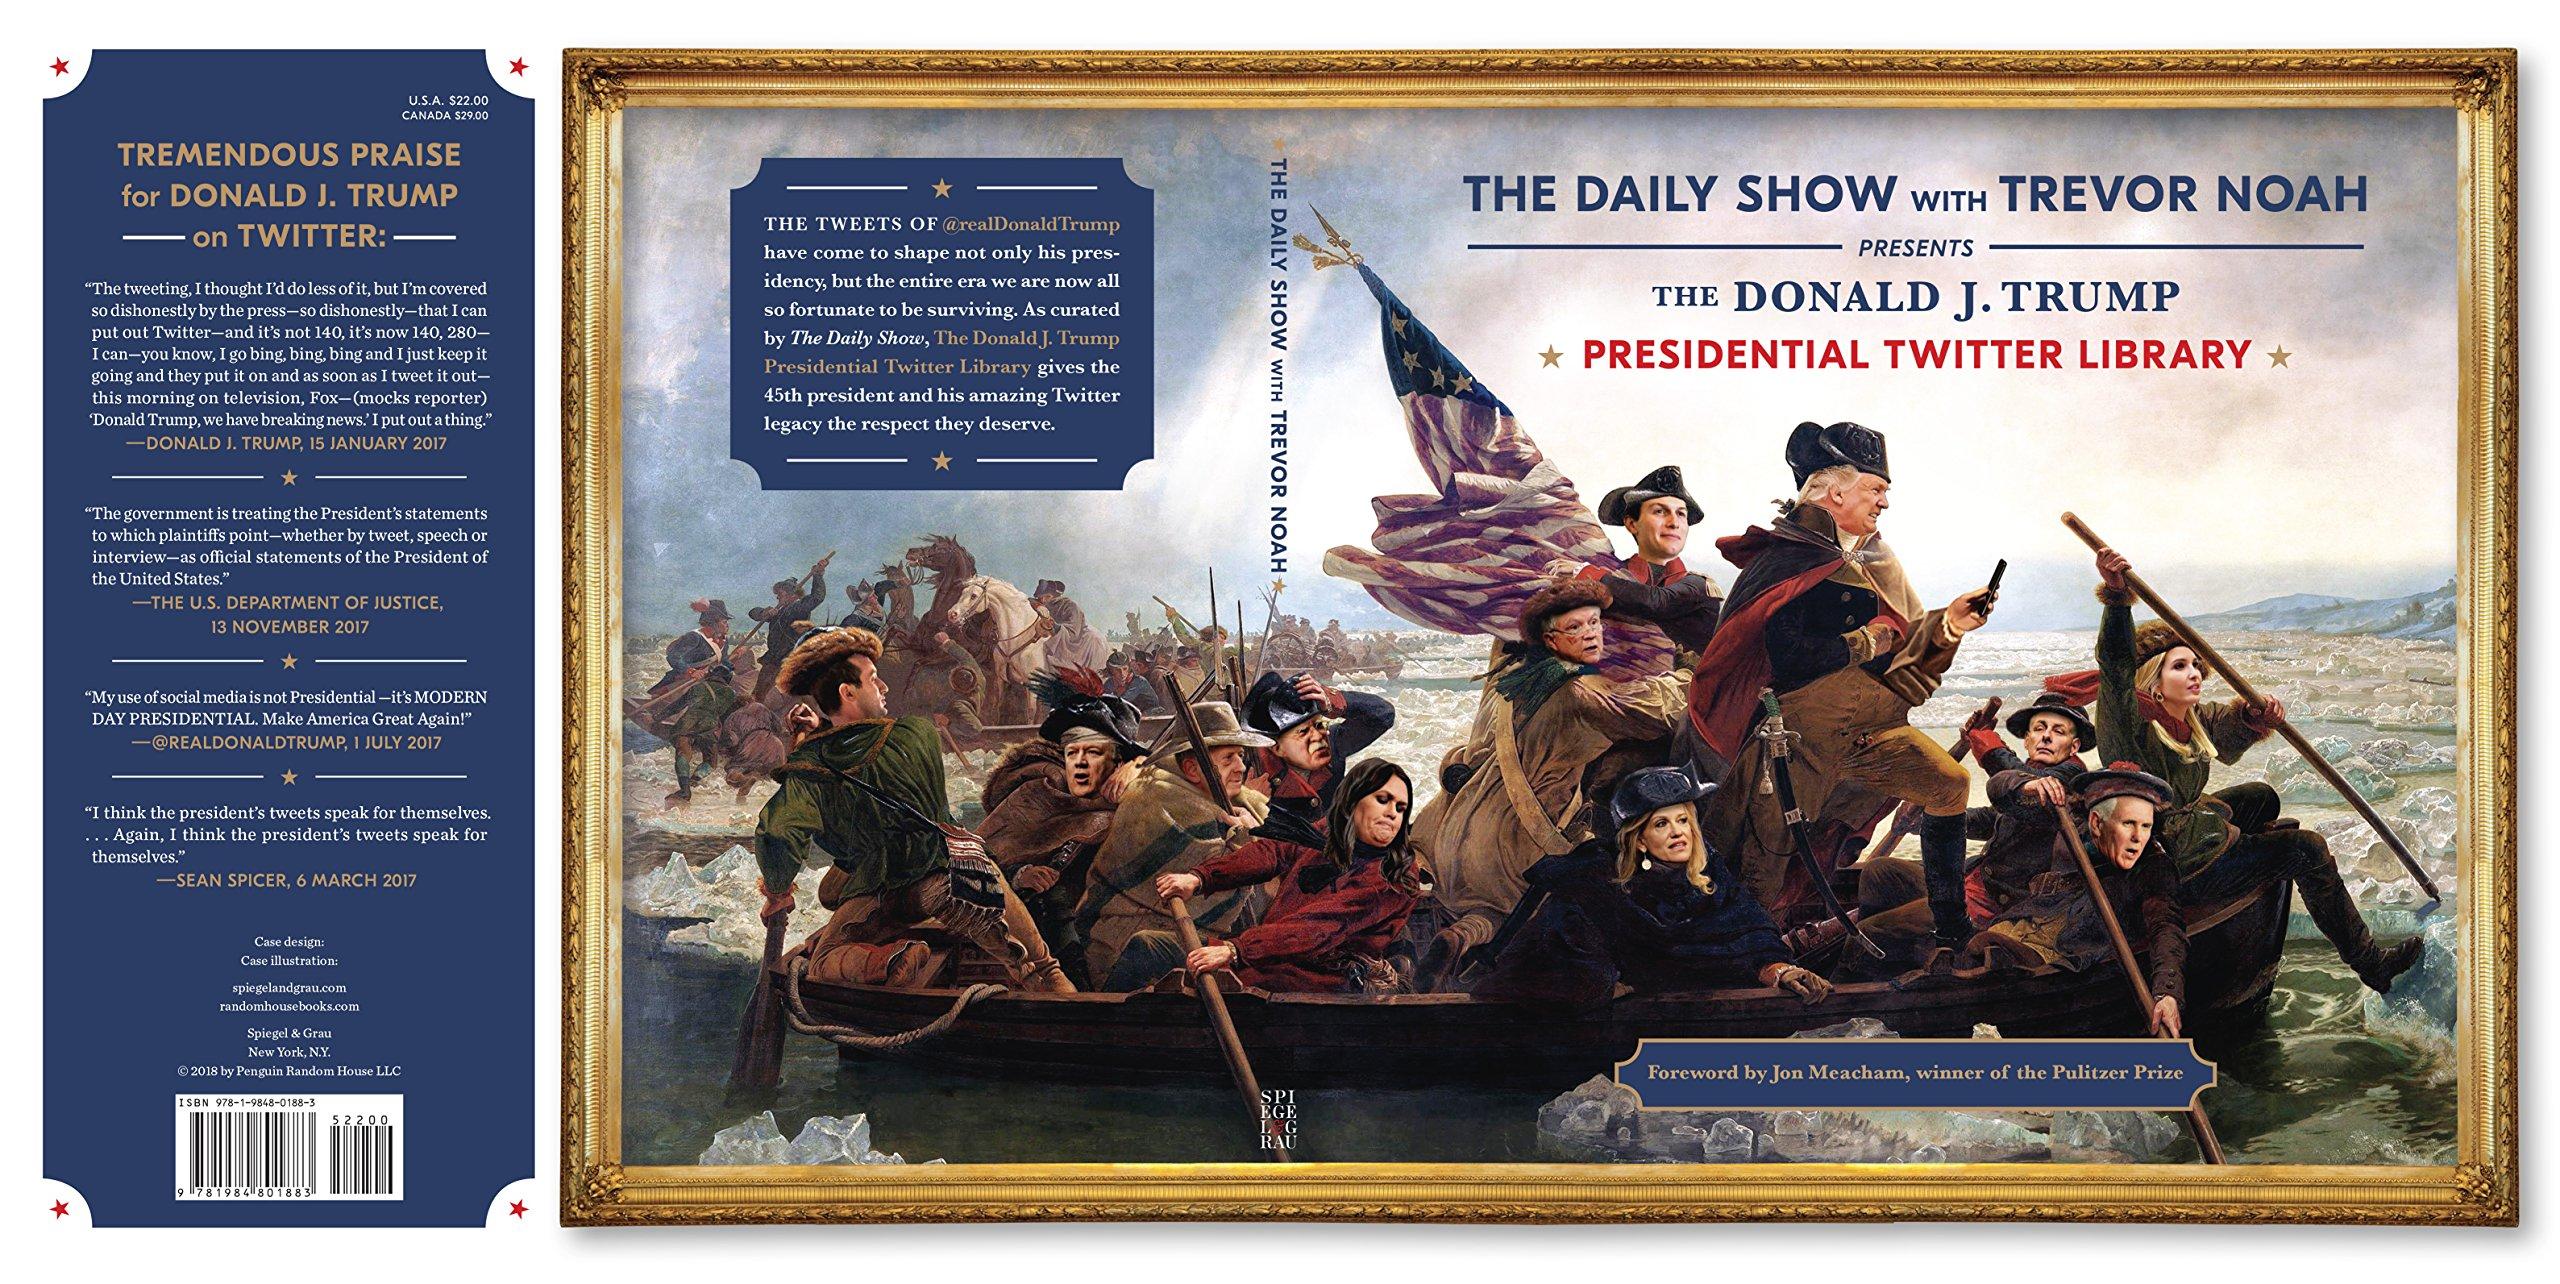 The Donald J Trump Presidential Twitter Library The Daily Show With Trevor Noah Meacham Jon 9781984801883 Amazon Com Books